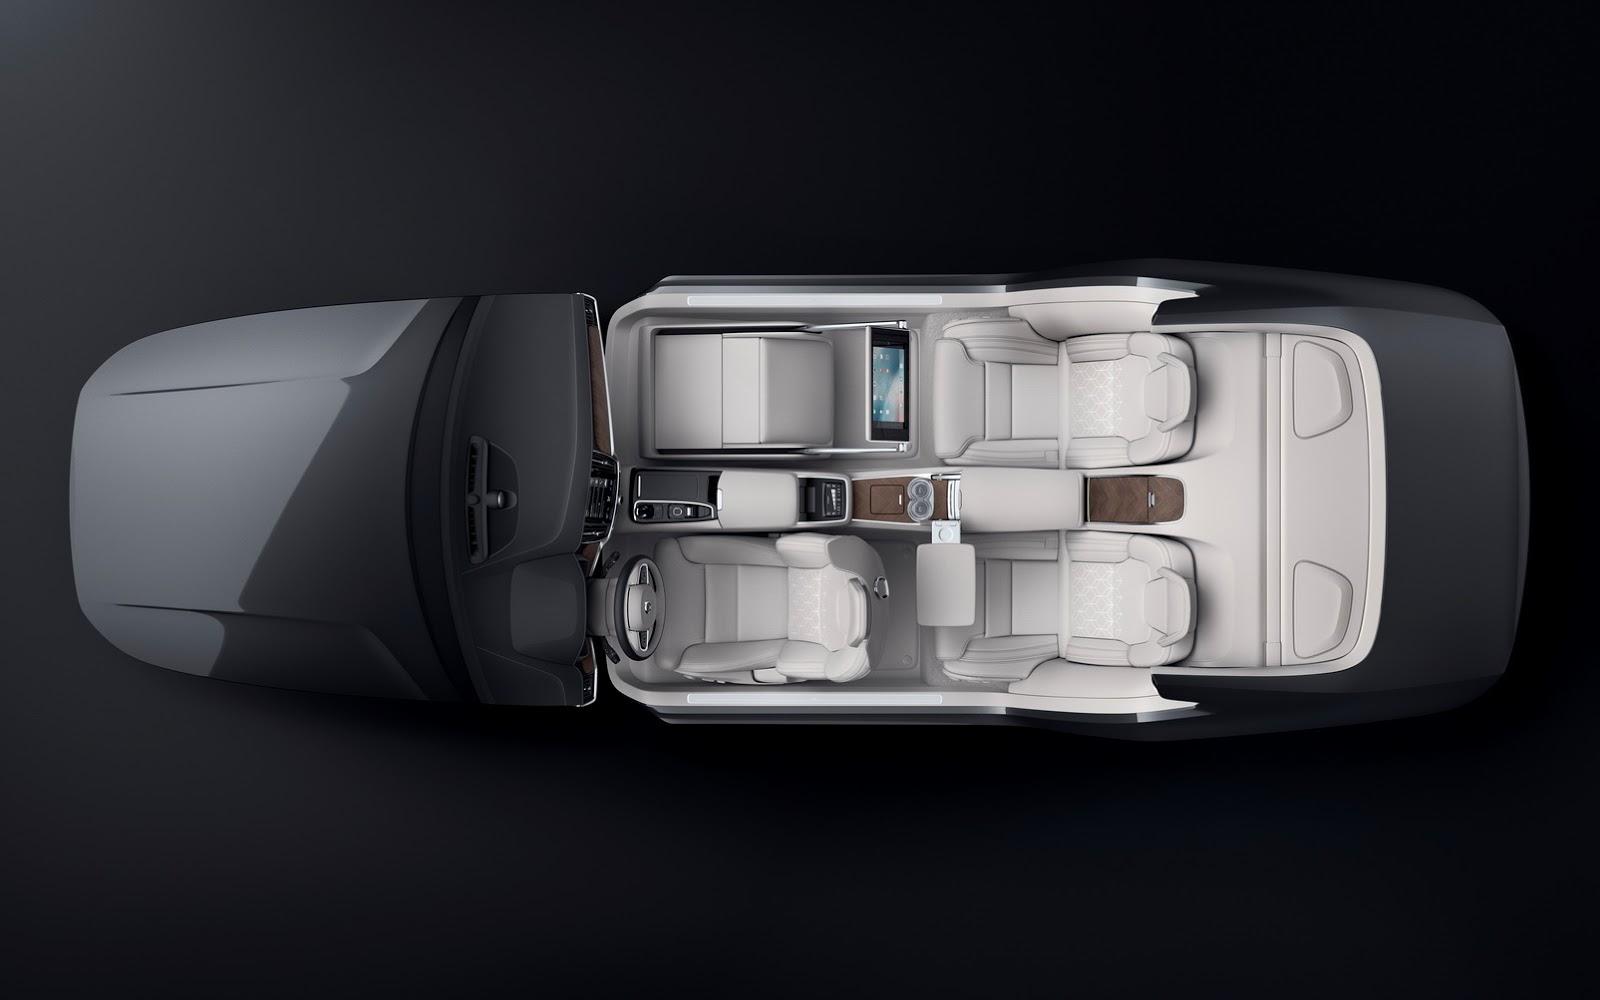 Volvo S90 Receives Lounge Interior Concept at Beijing Auto Show - autoevolution